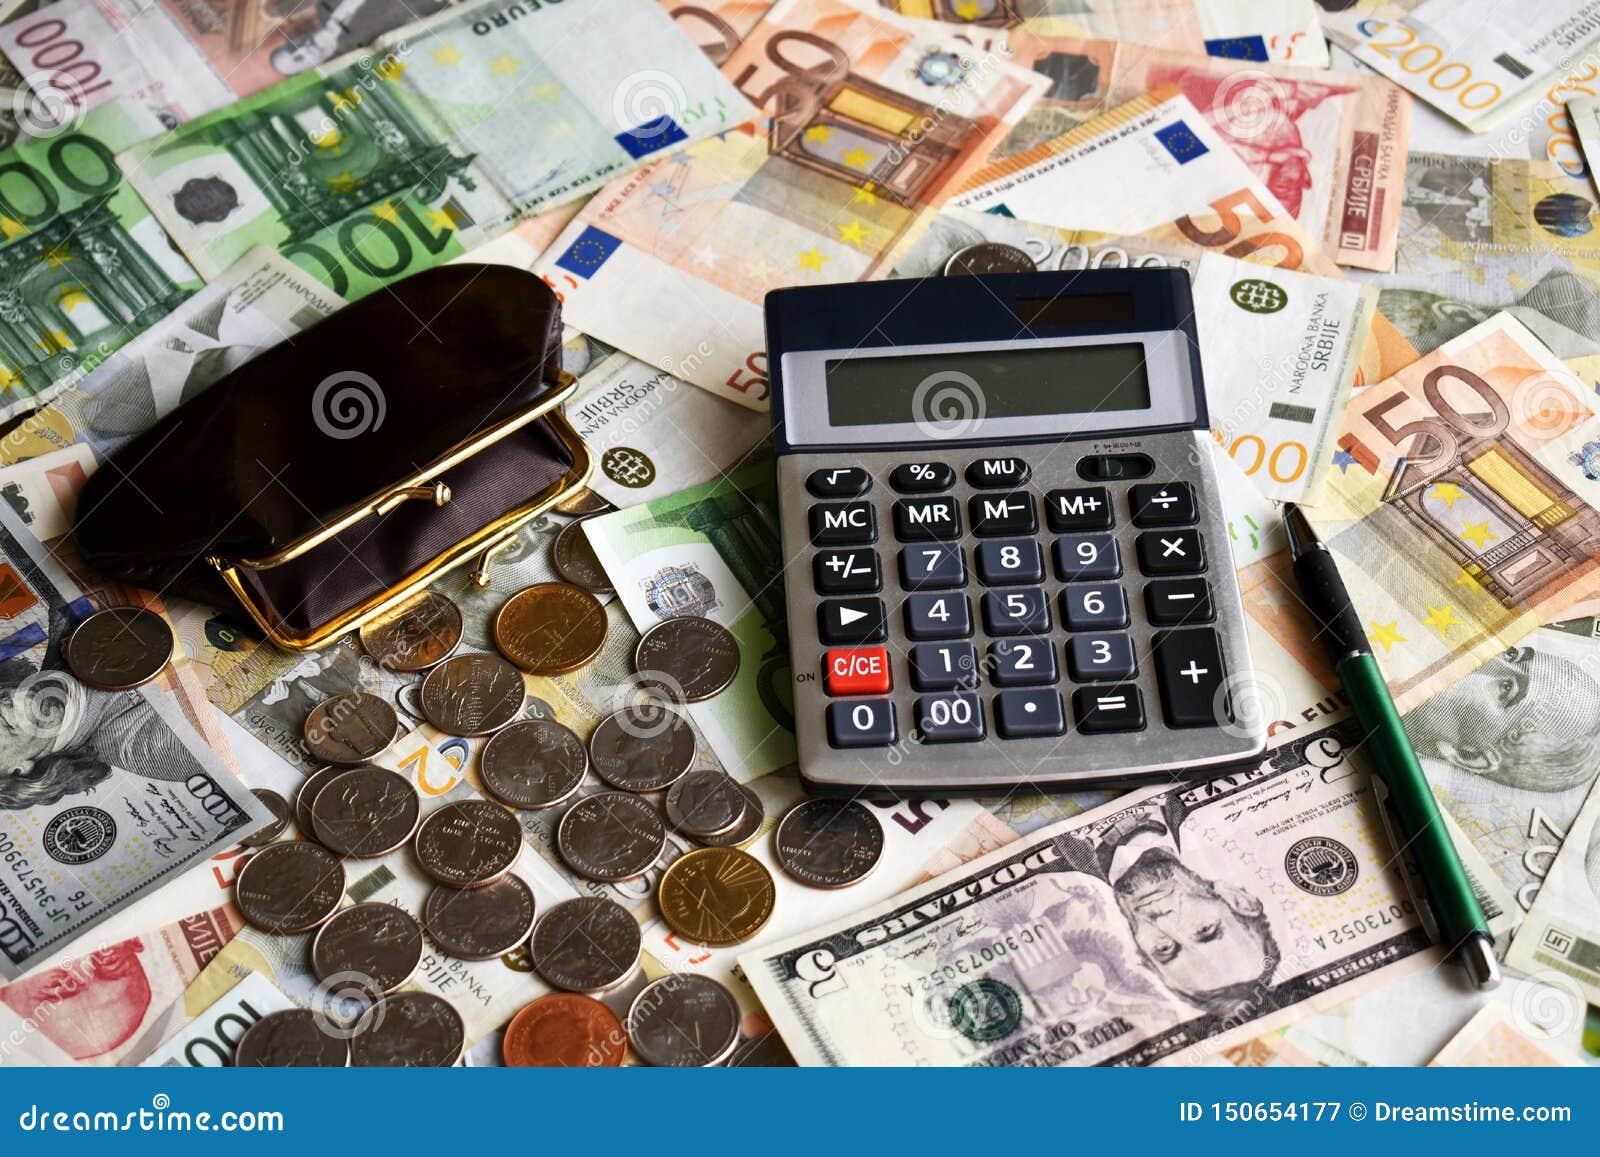 Wallet calculator ball pen coins and paper money